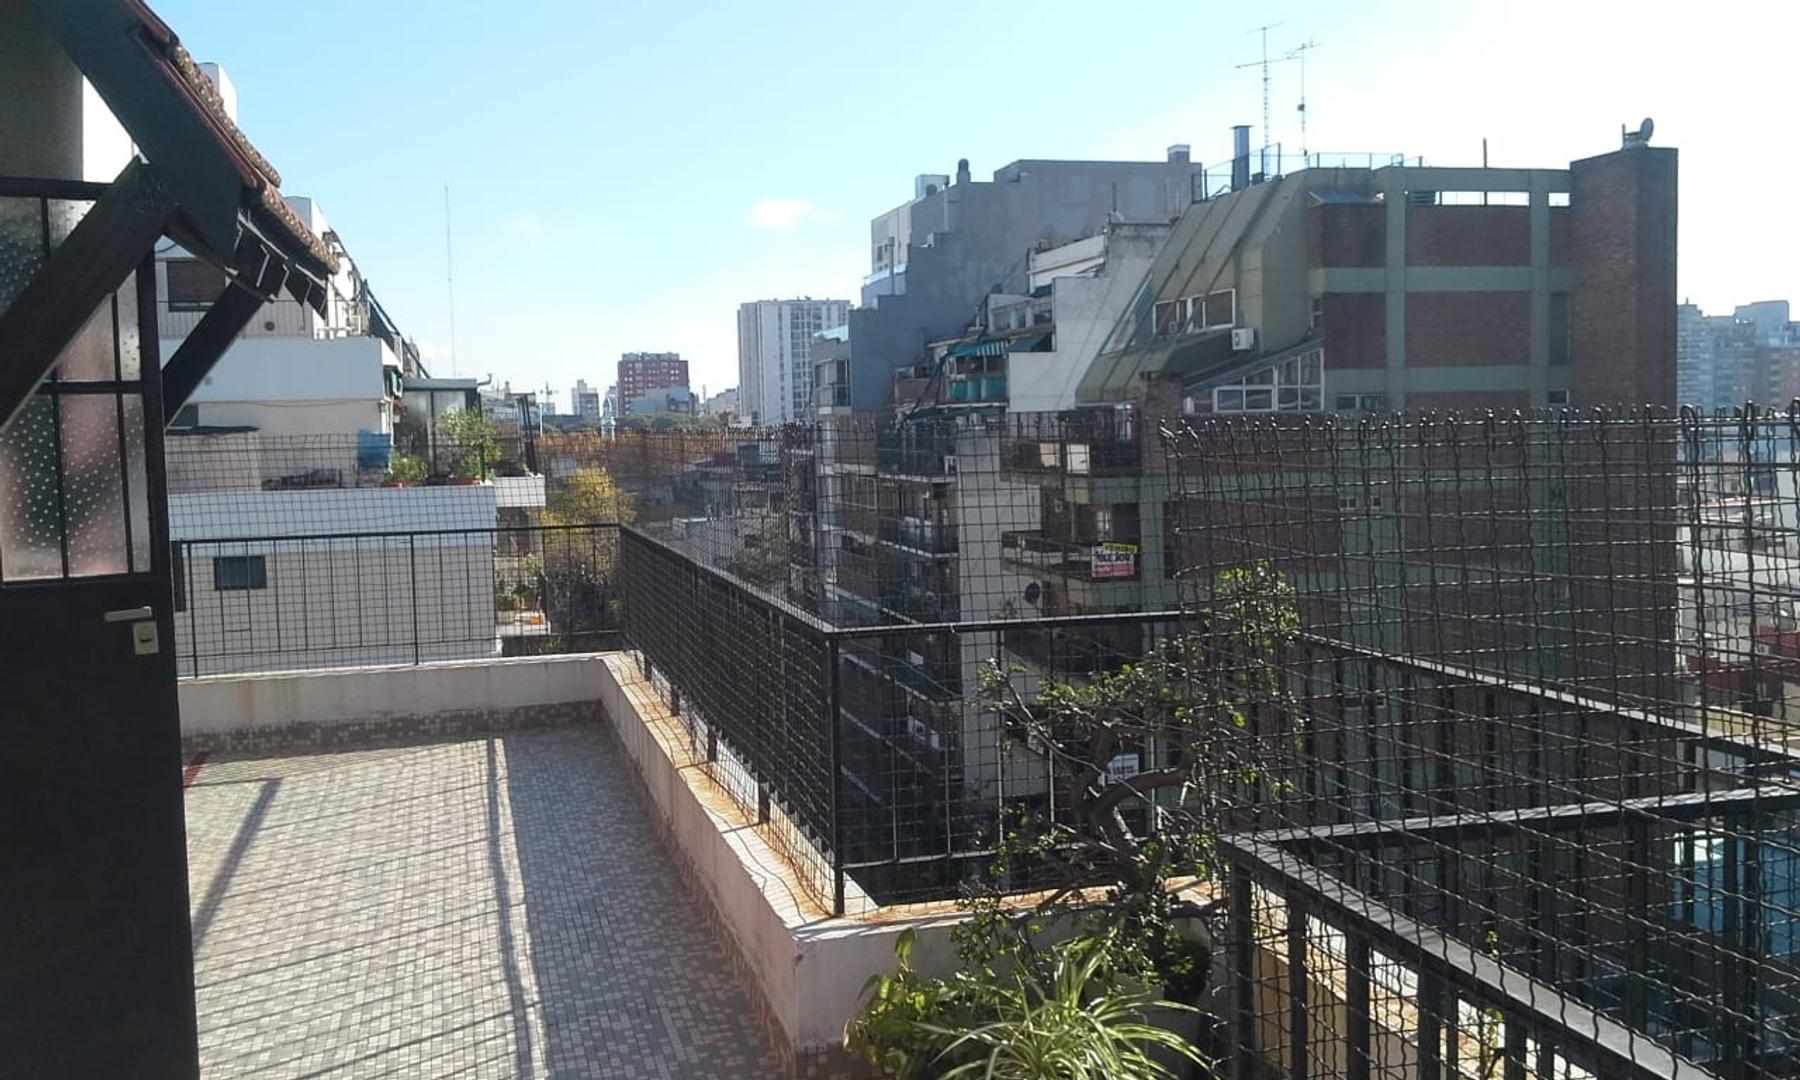 3 ambientes c/baulera a la venta - Olazabal 5100 7° - VILLA URQUIZA